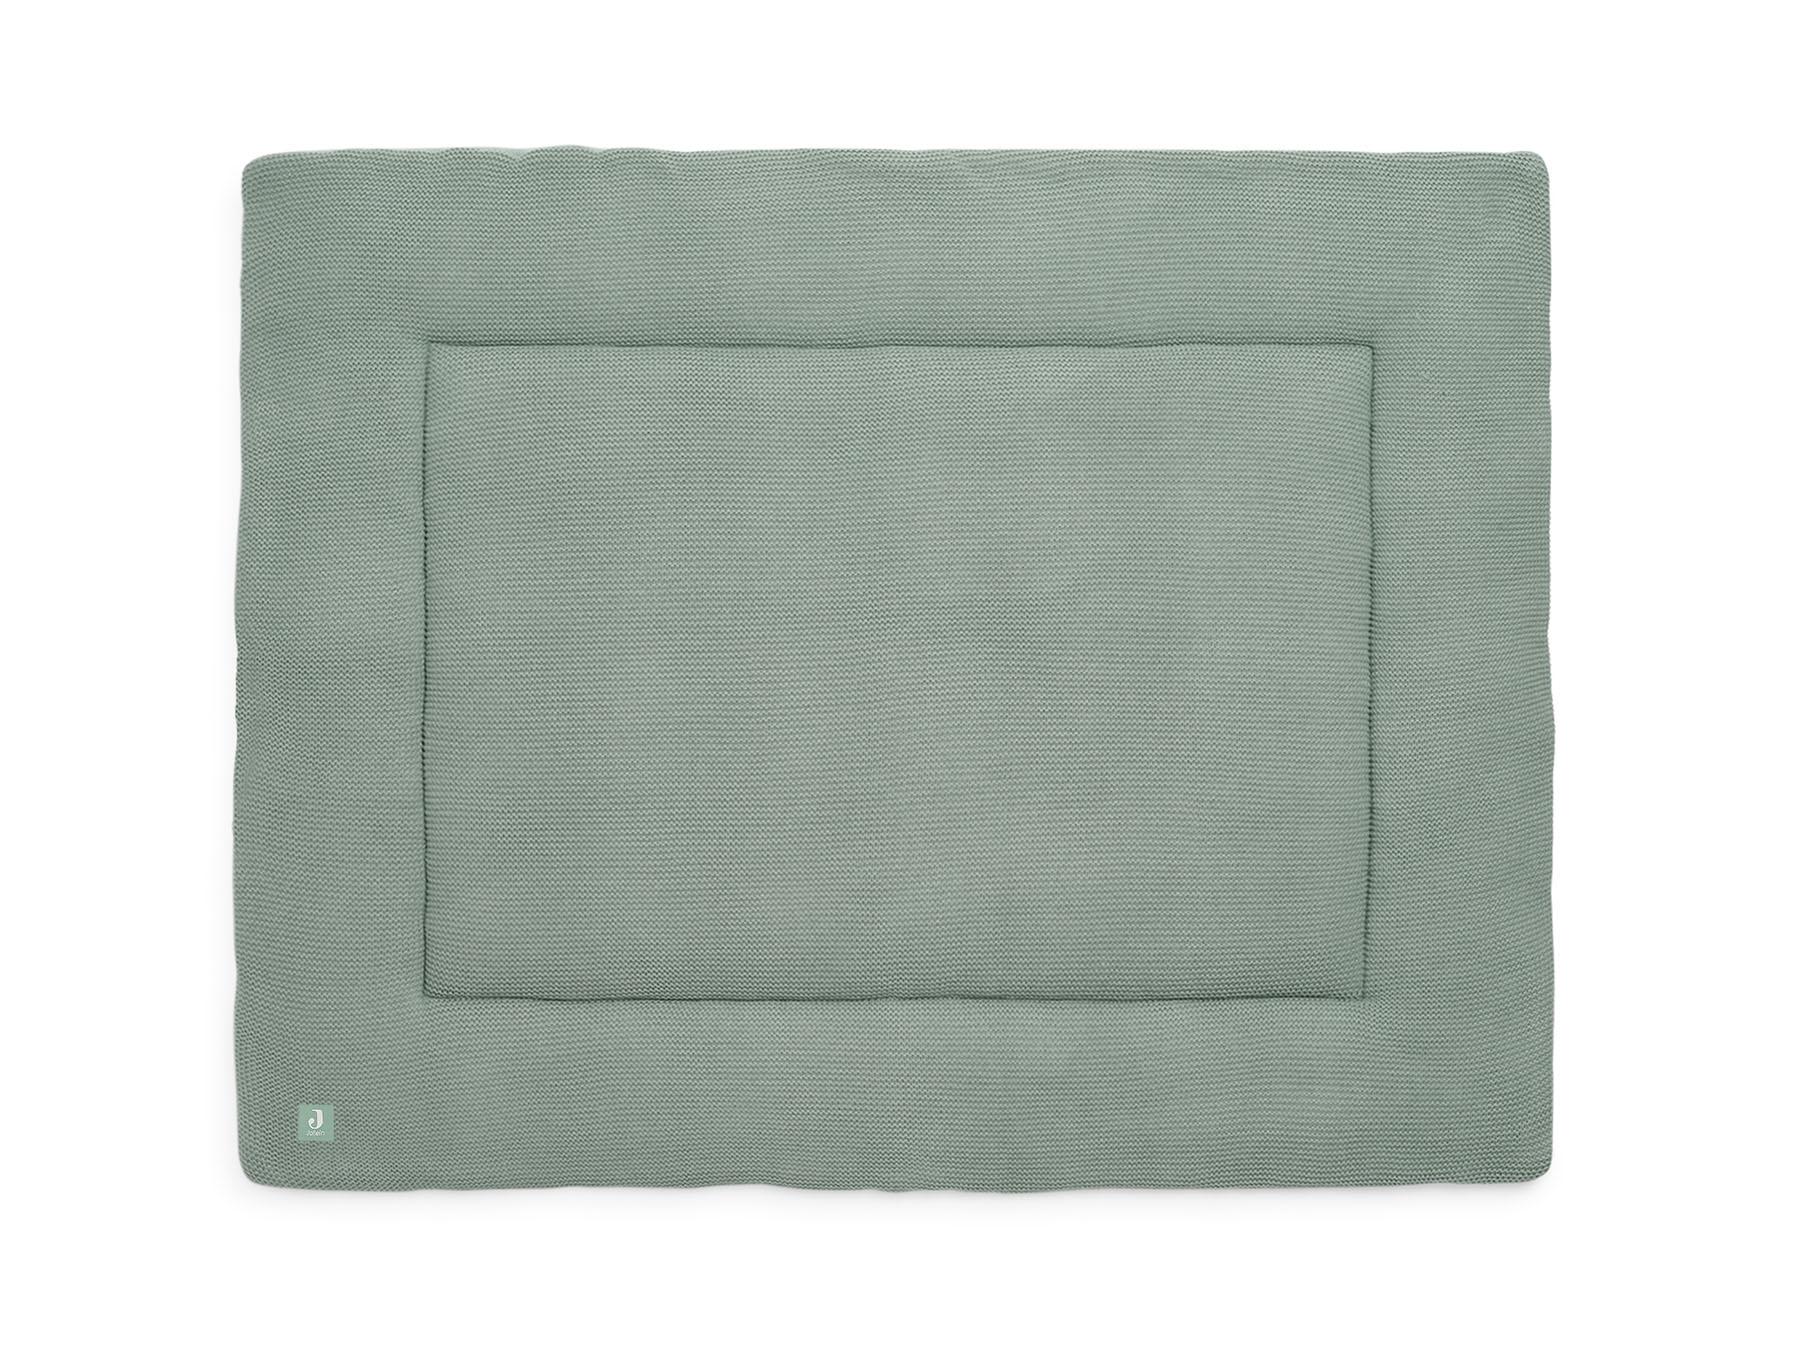 Laufgittereinlage Krabbeldecke Strick Basic Knit stone green (80x100 cm)